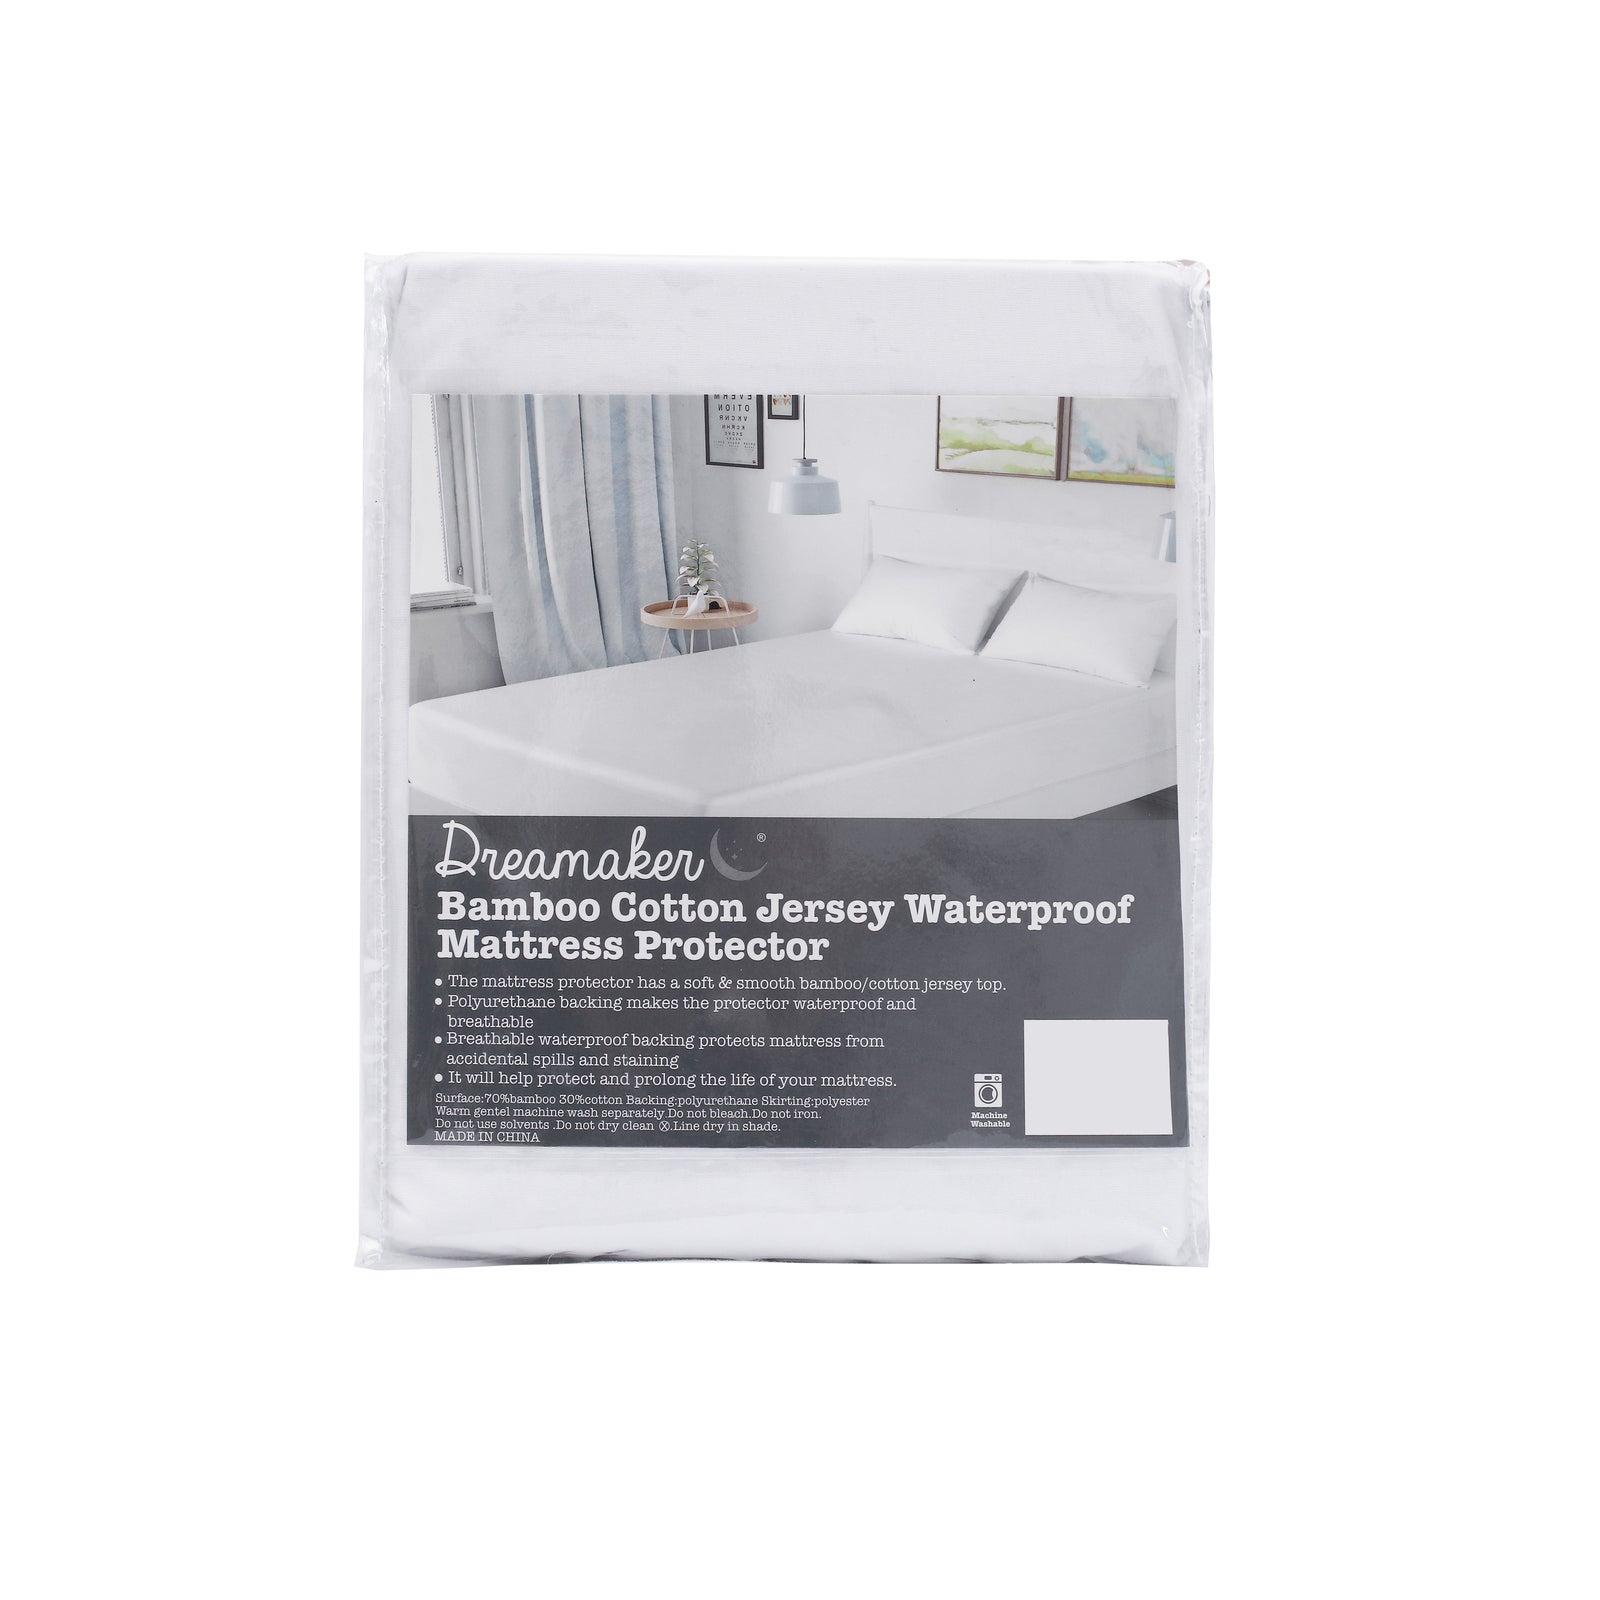 Dreamaker Bamboo Cotton Jersey Waterproof Mattress Protector - King Bed